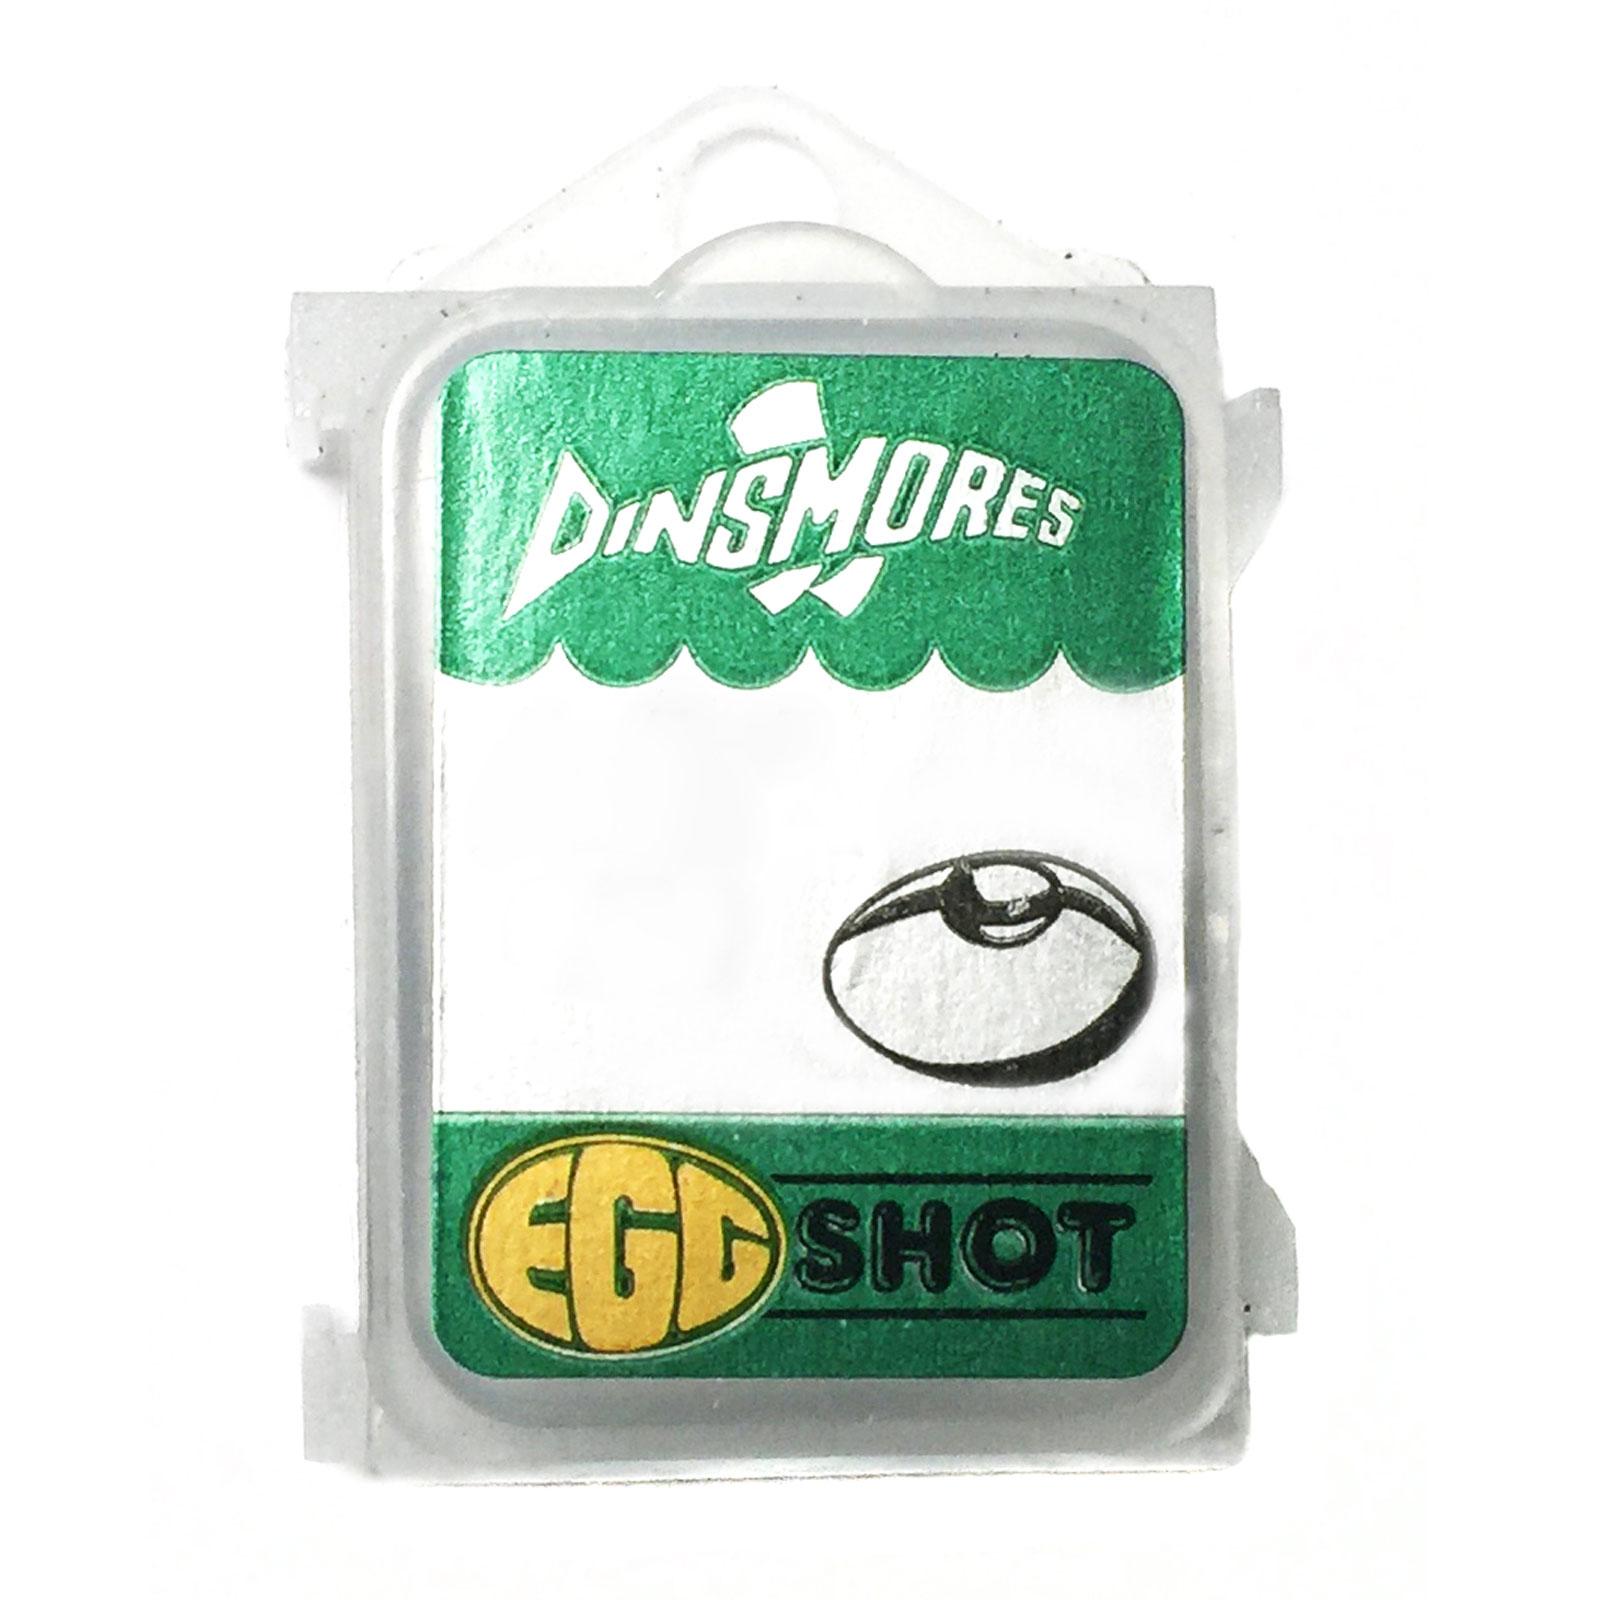 Dinsmores Non-Toxic Super Soft Cushion 4-Way Shot